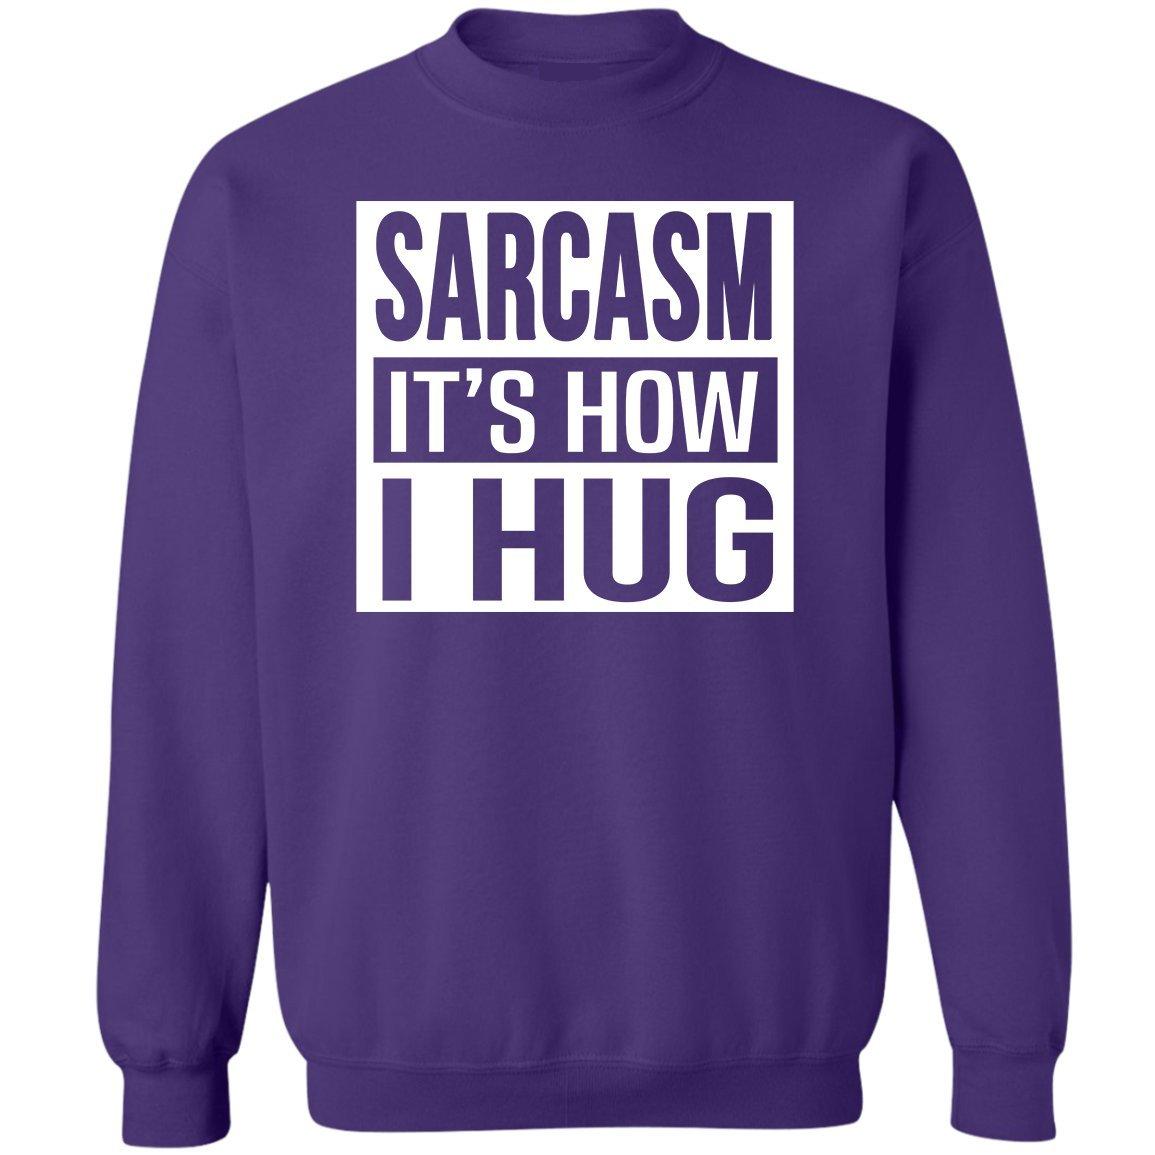 VADOBA Sarcasm Its How I Hug Funny Shirt Men Women Saying Quotes Sarcasm Sweatshirt